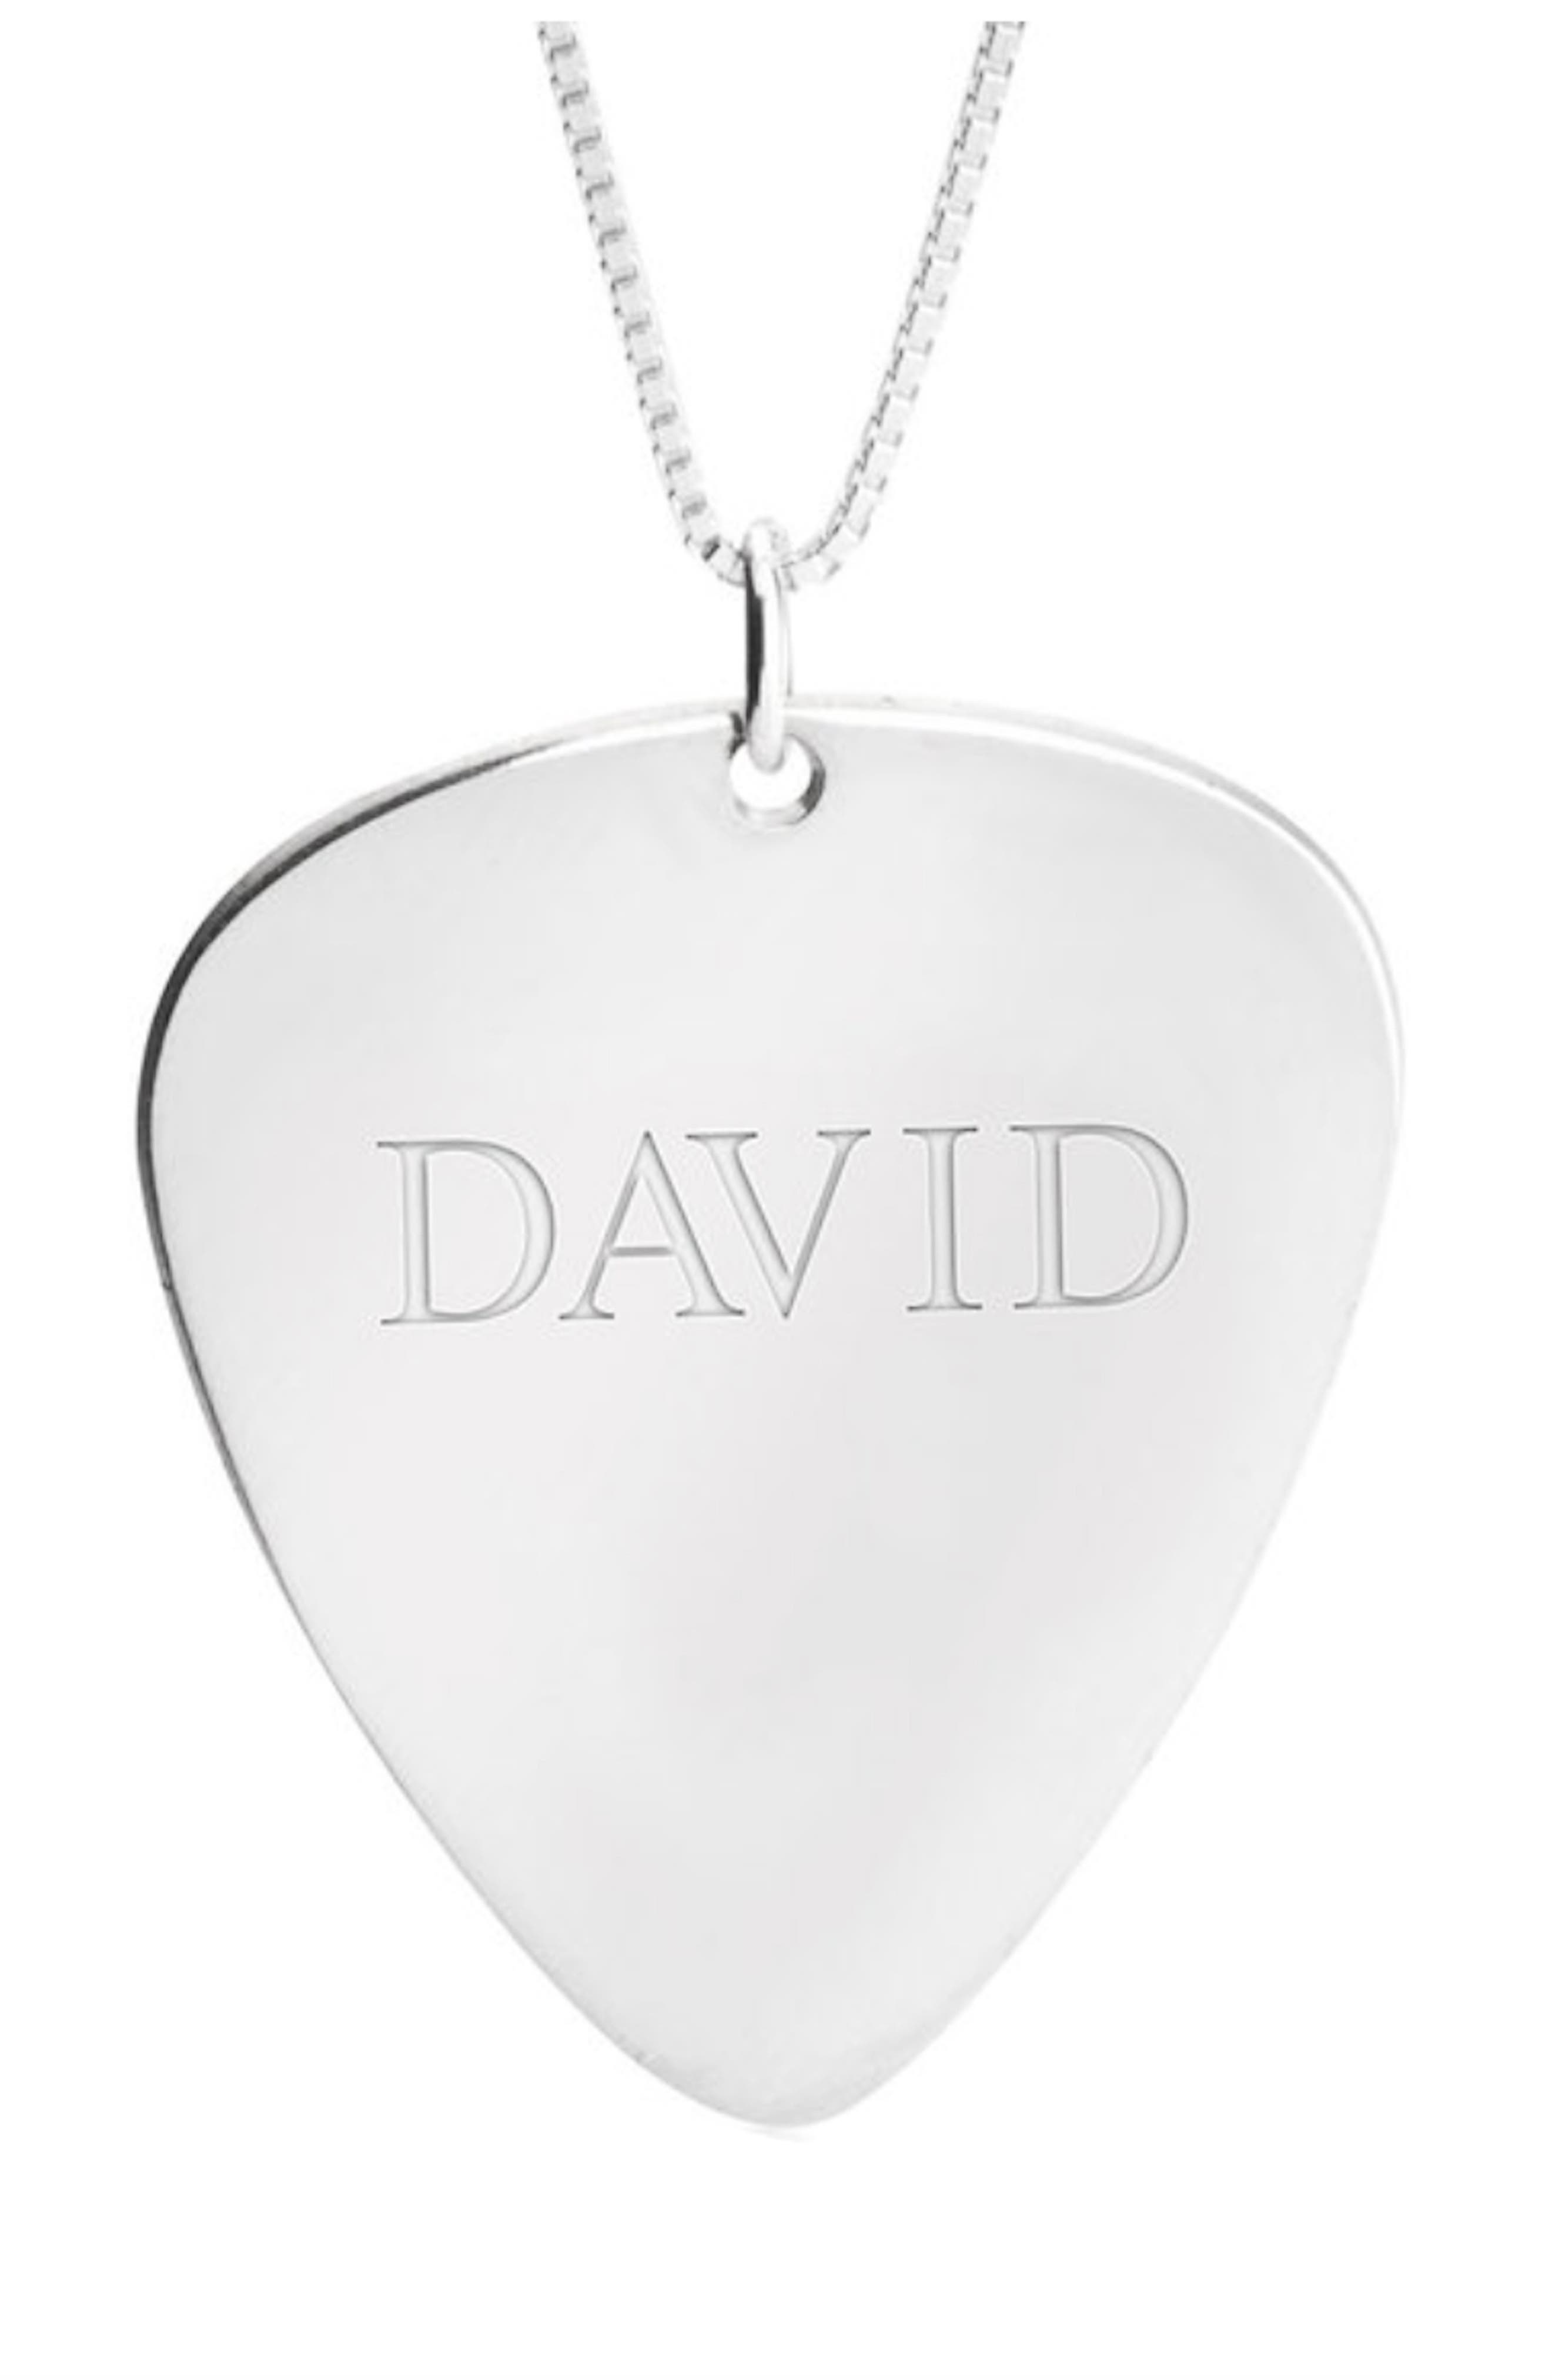 Personalized Guitar Pick Pendant Necklace